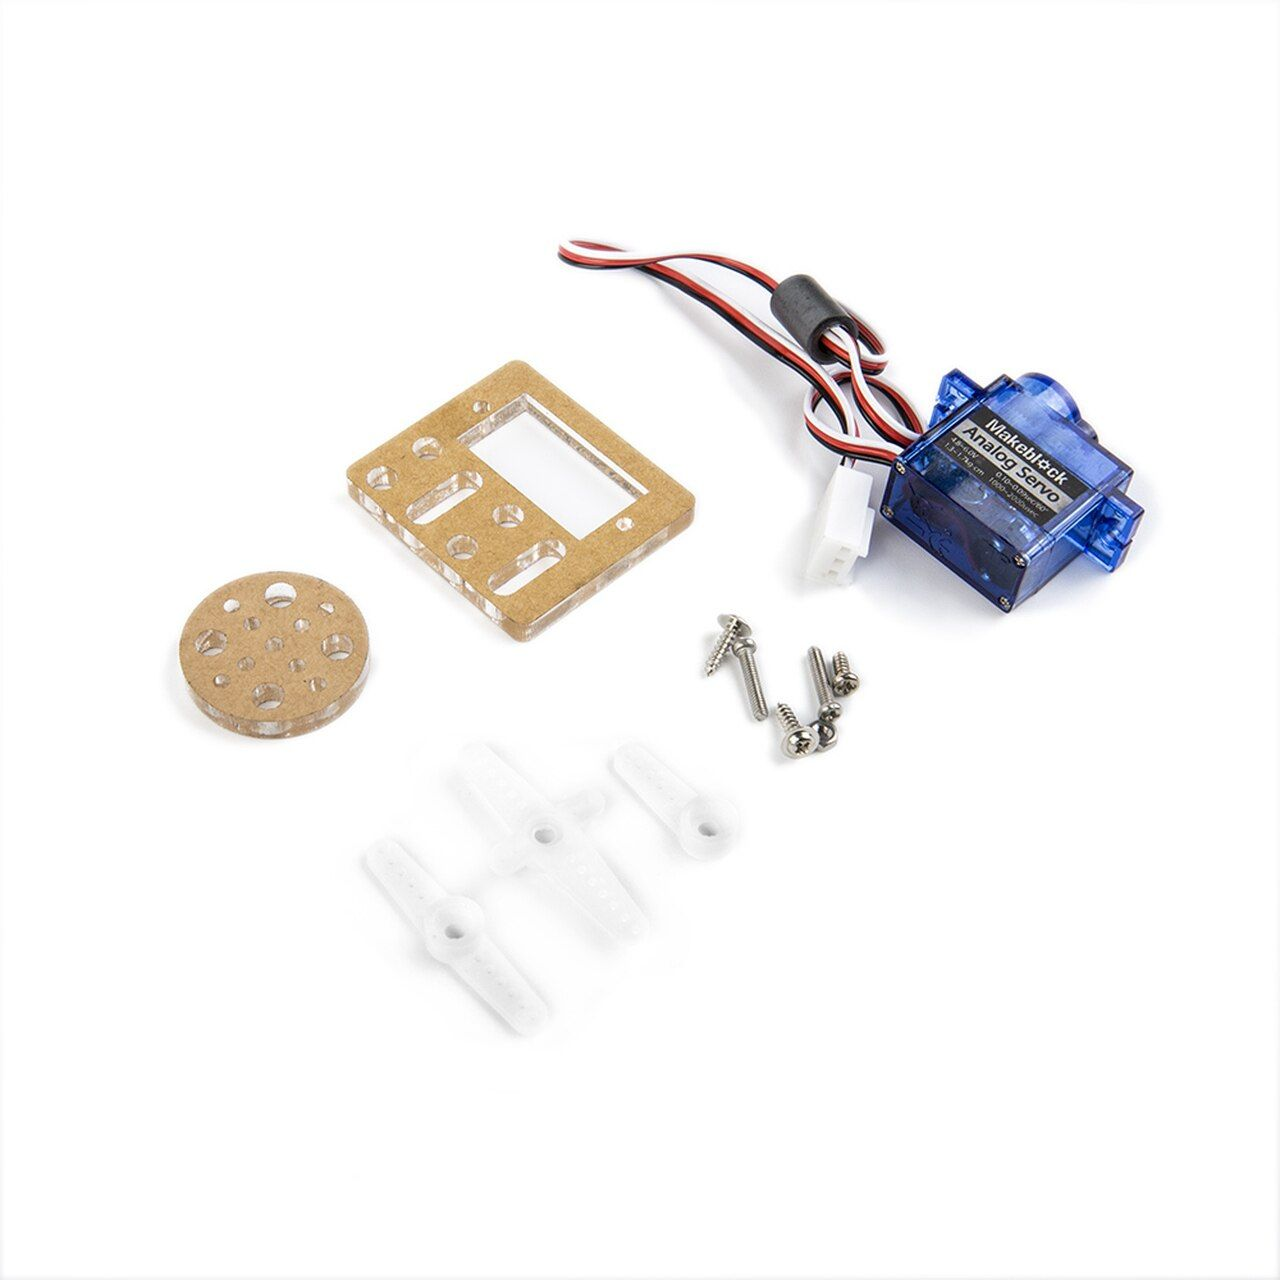 Makeblock 9g Micro Servo Robot pack